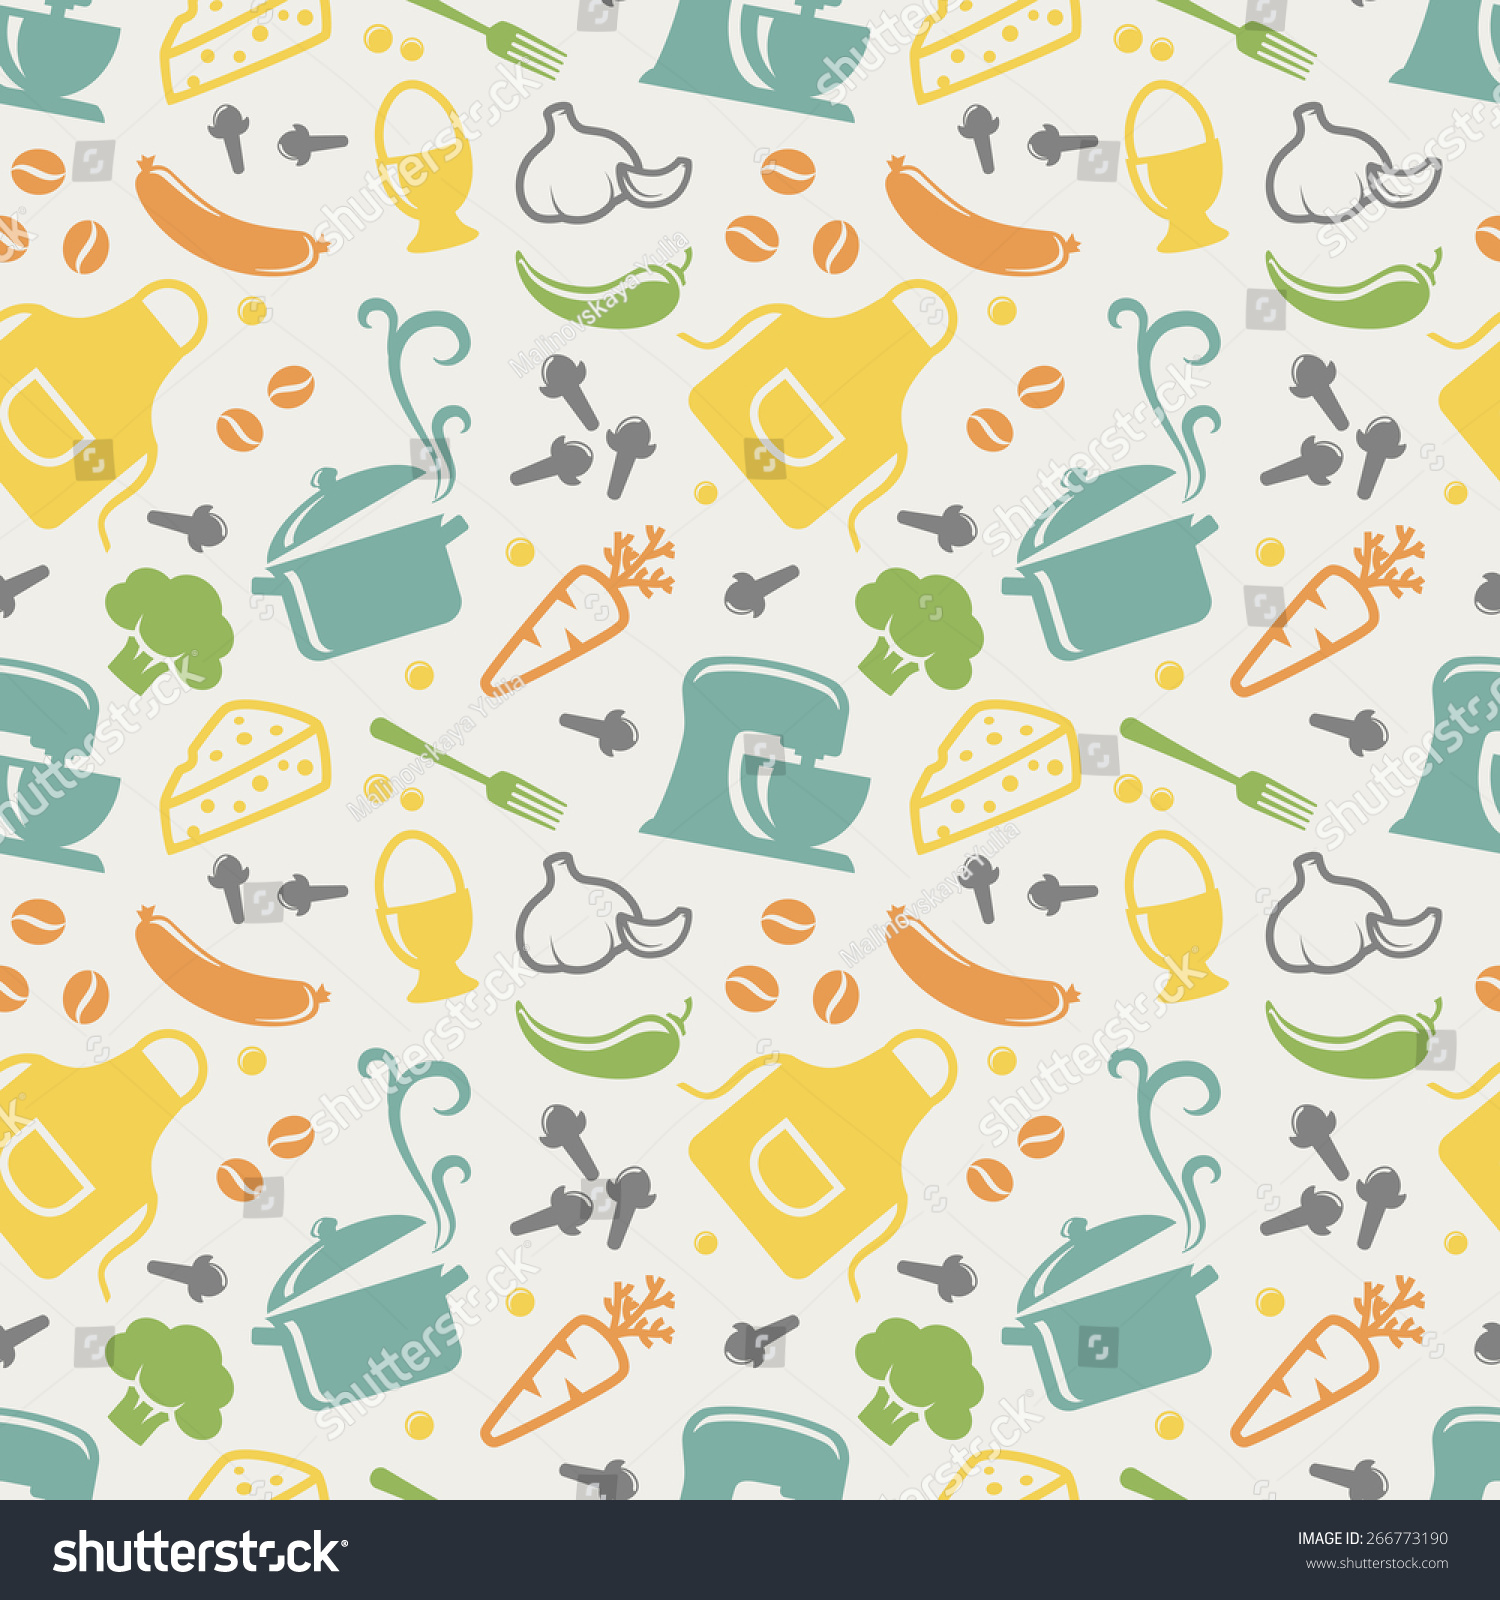 Food Kitchen Seamless Pattern Blue Yellow Stock Vector 266773190 ...